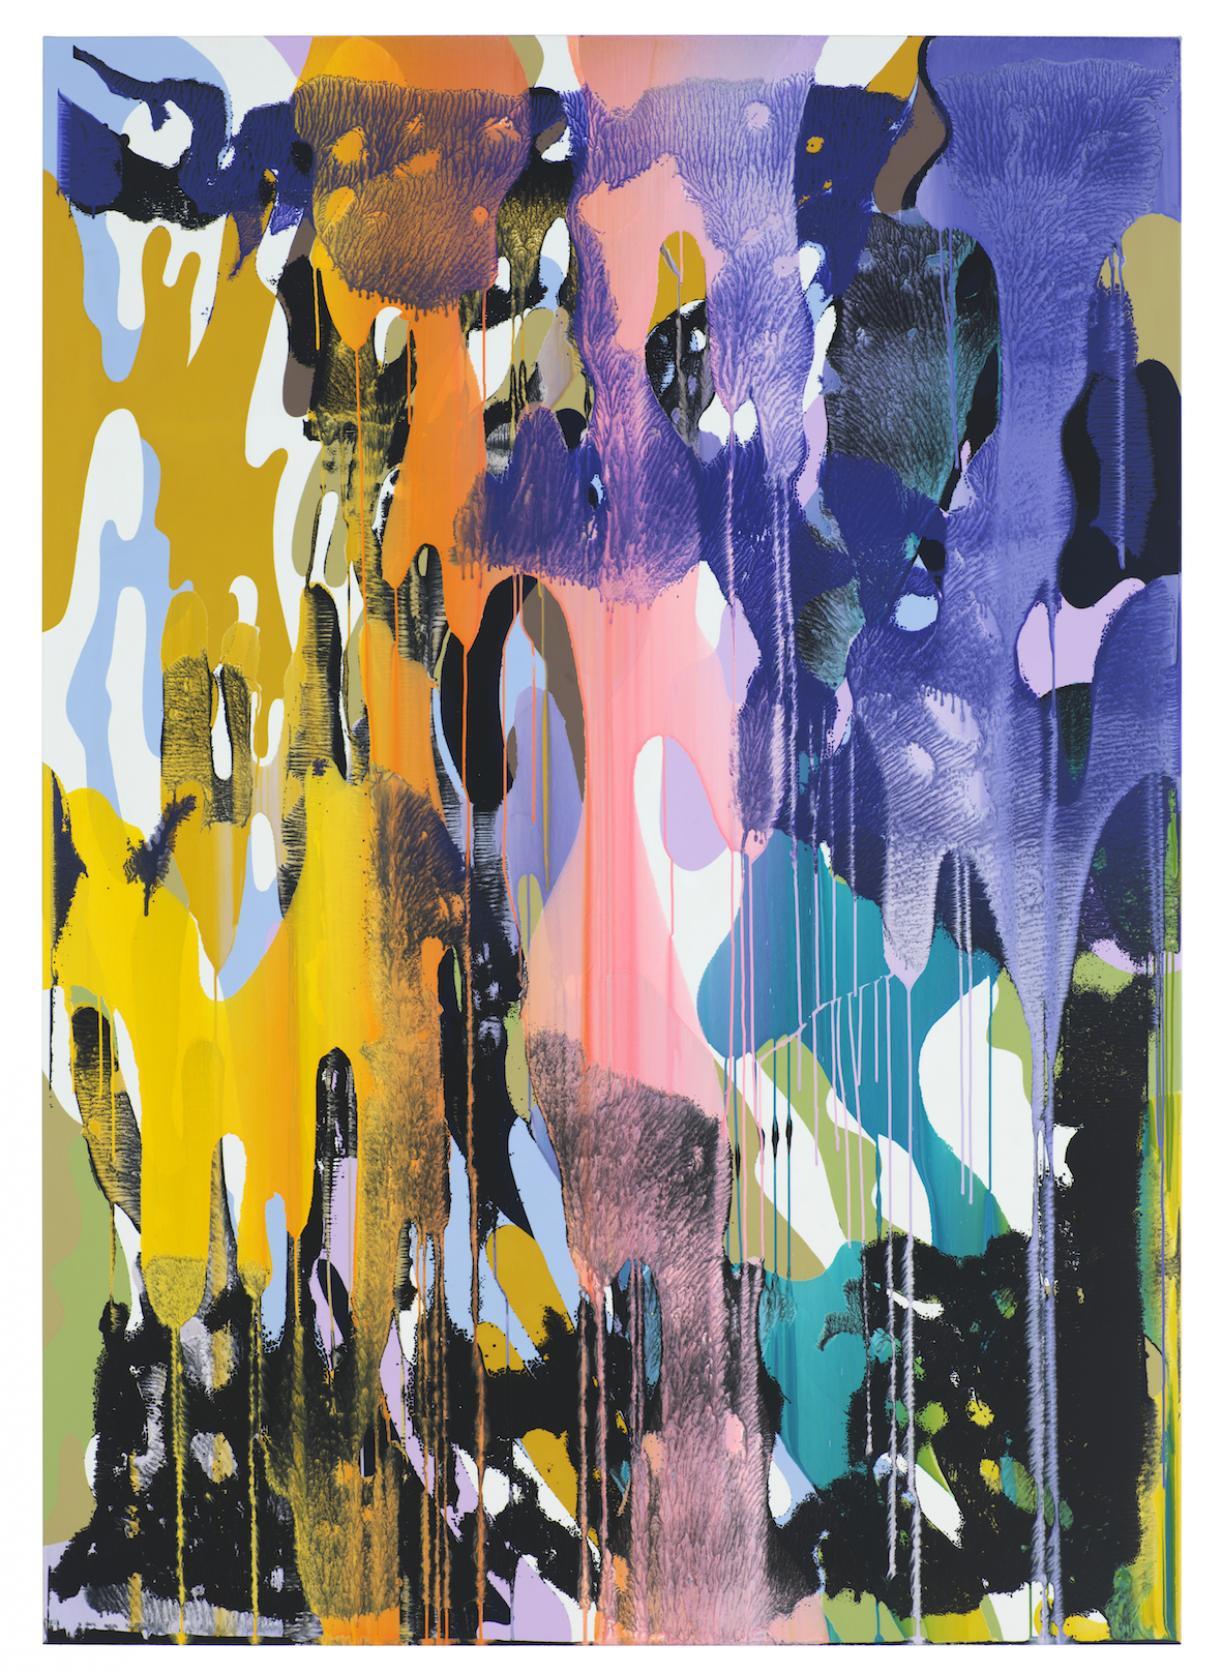 Christine Streuli, Warainting_003, 2016/17, Mixed media on canvas, 243,5 x 173 cm